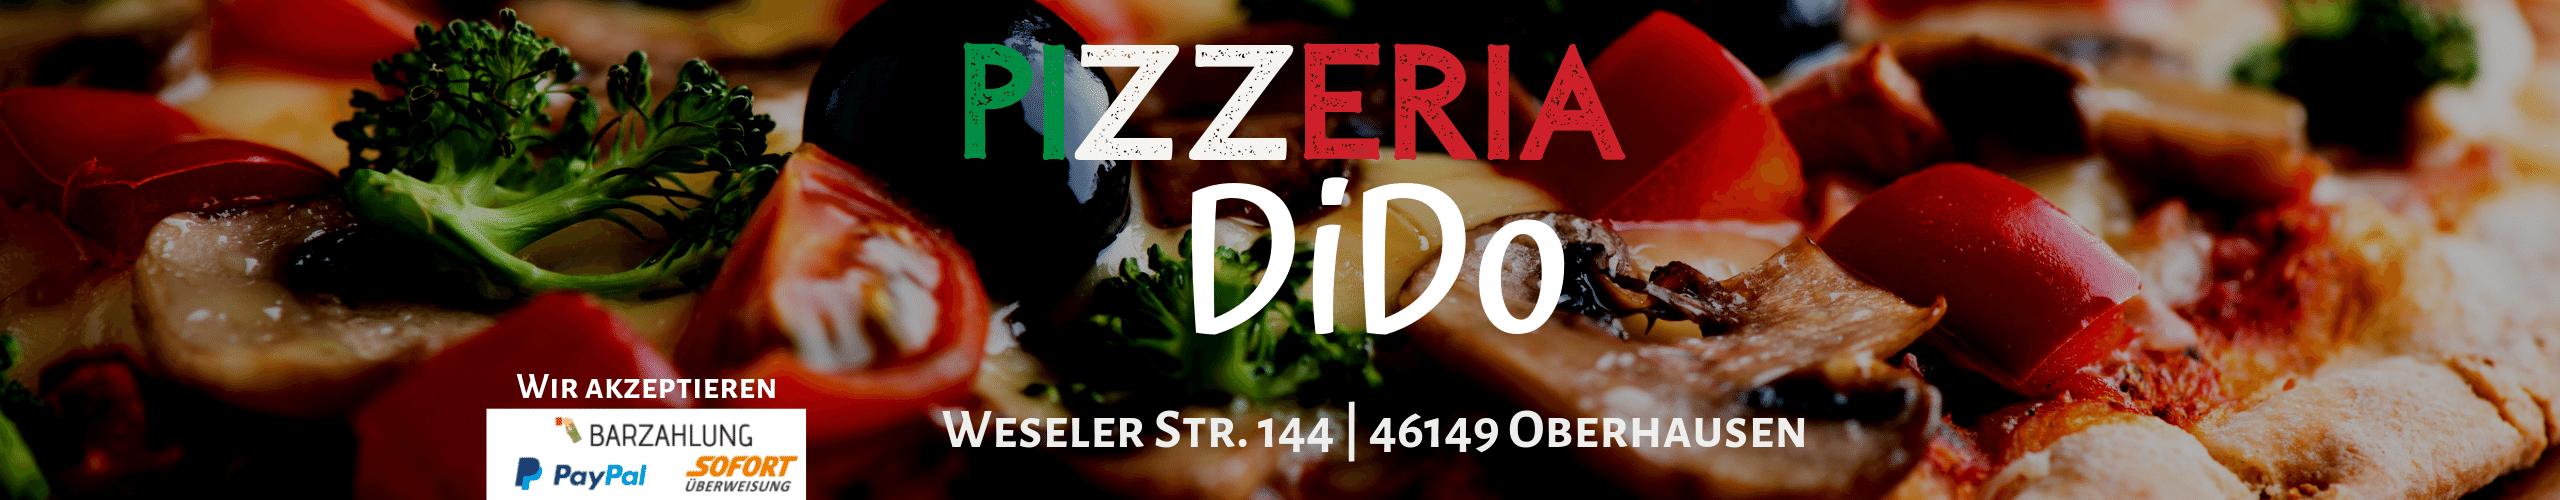 Pizzeria Dido Oberhausen, Weseler Str. 144, 46149 Oberhausen